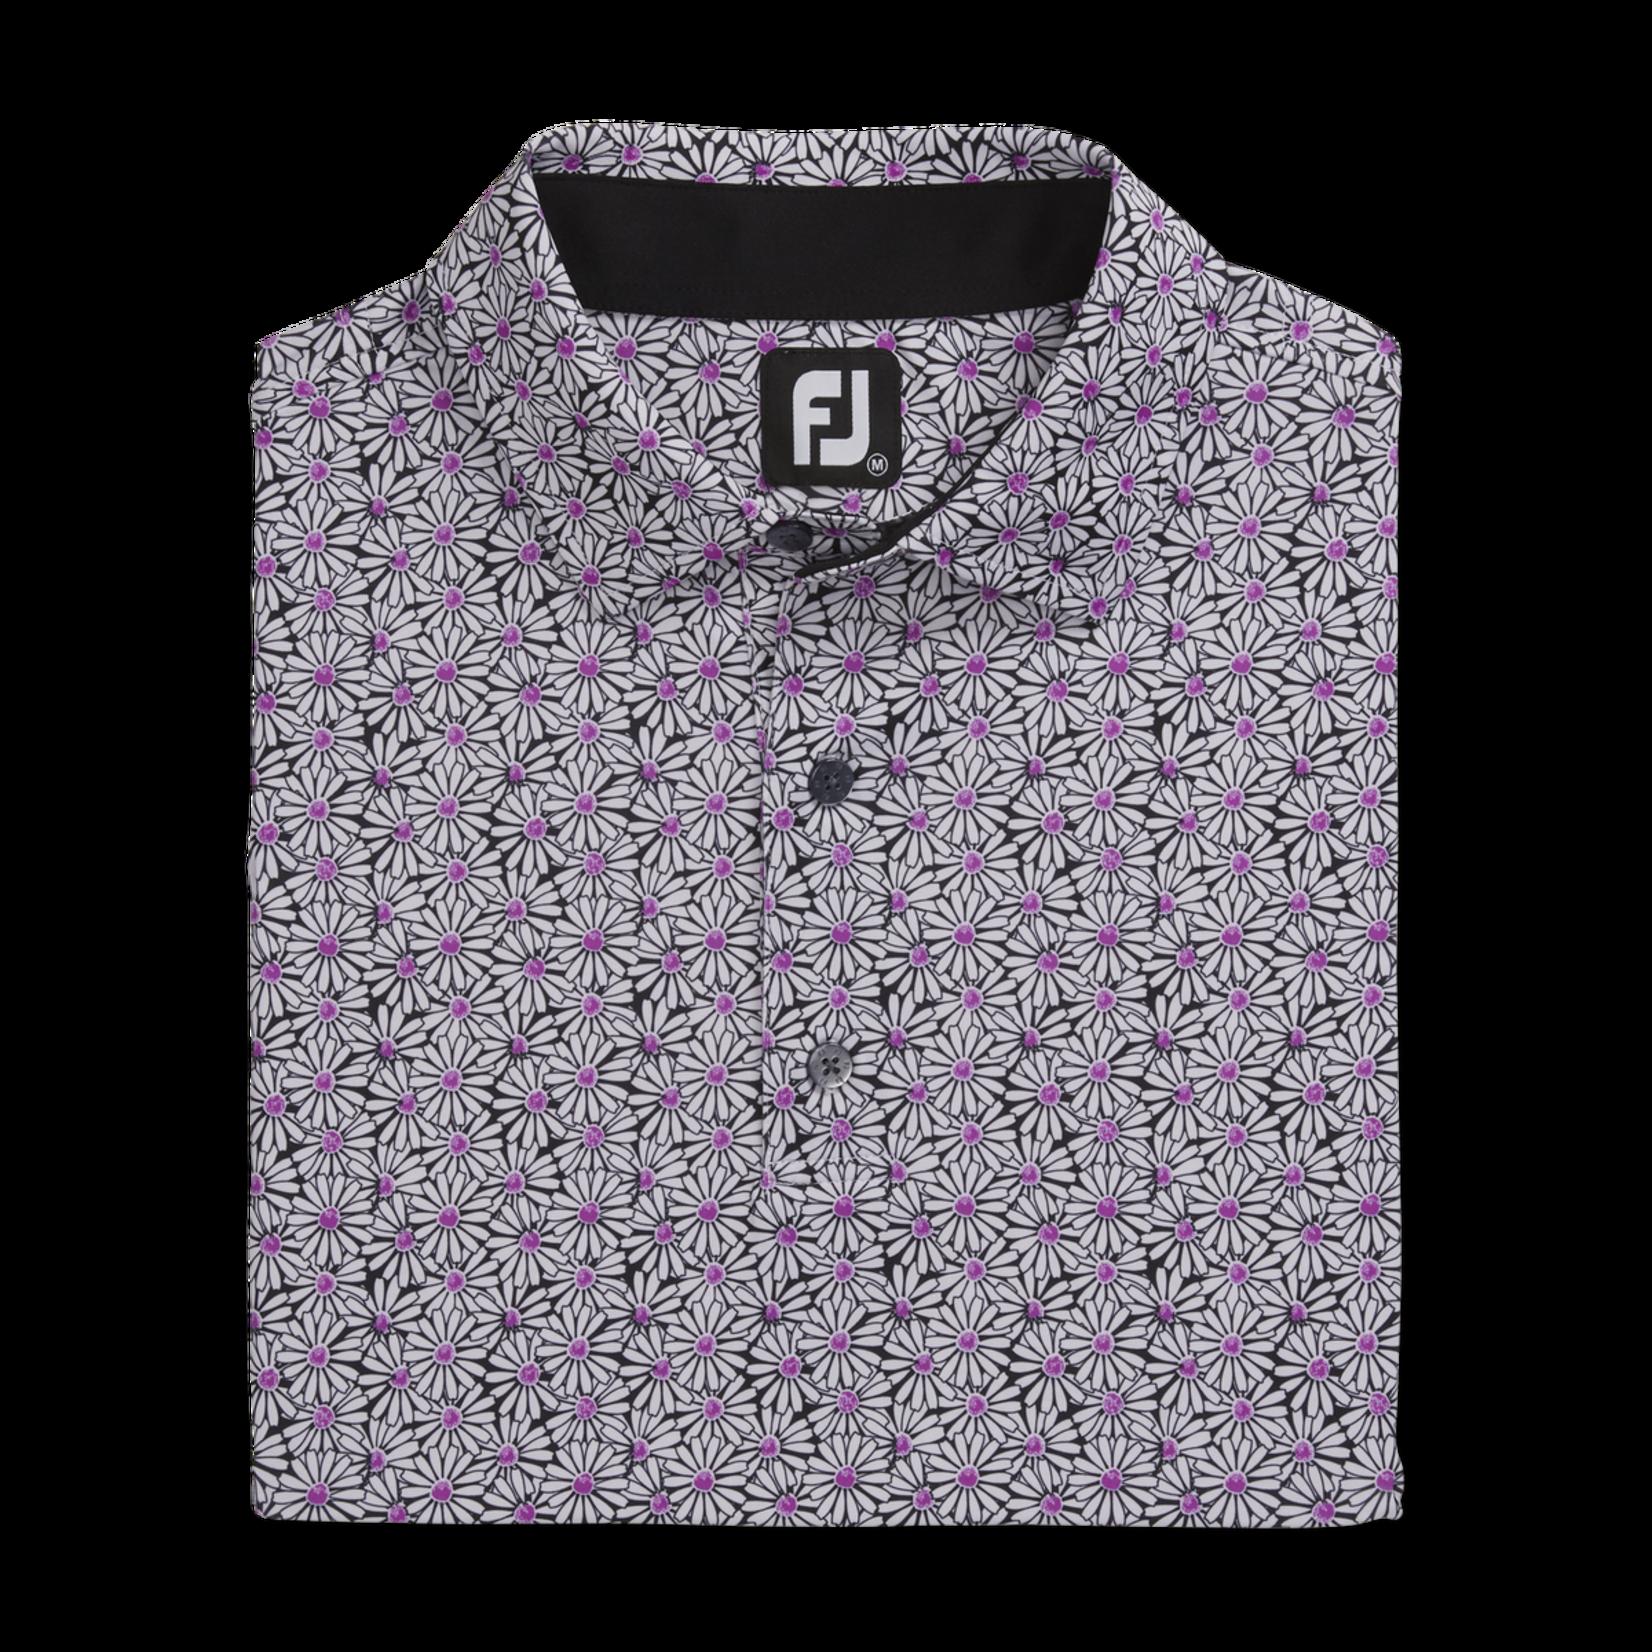 Footjoy FJ Lsl Daisy Print Self Collar Polo '21